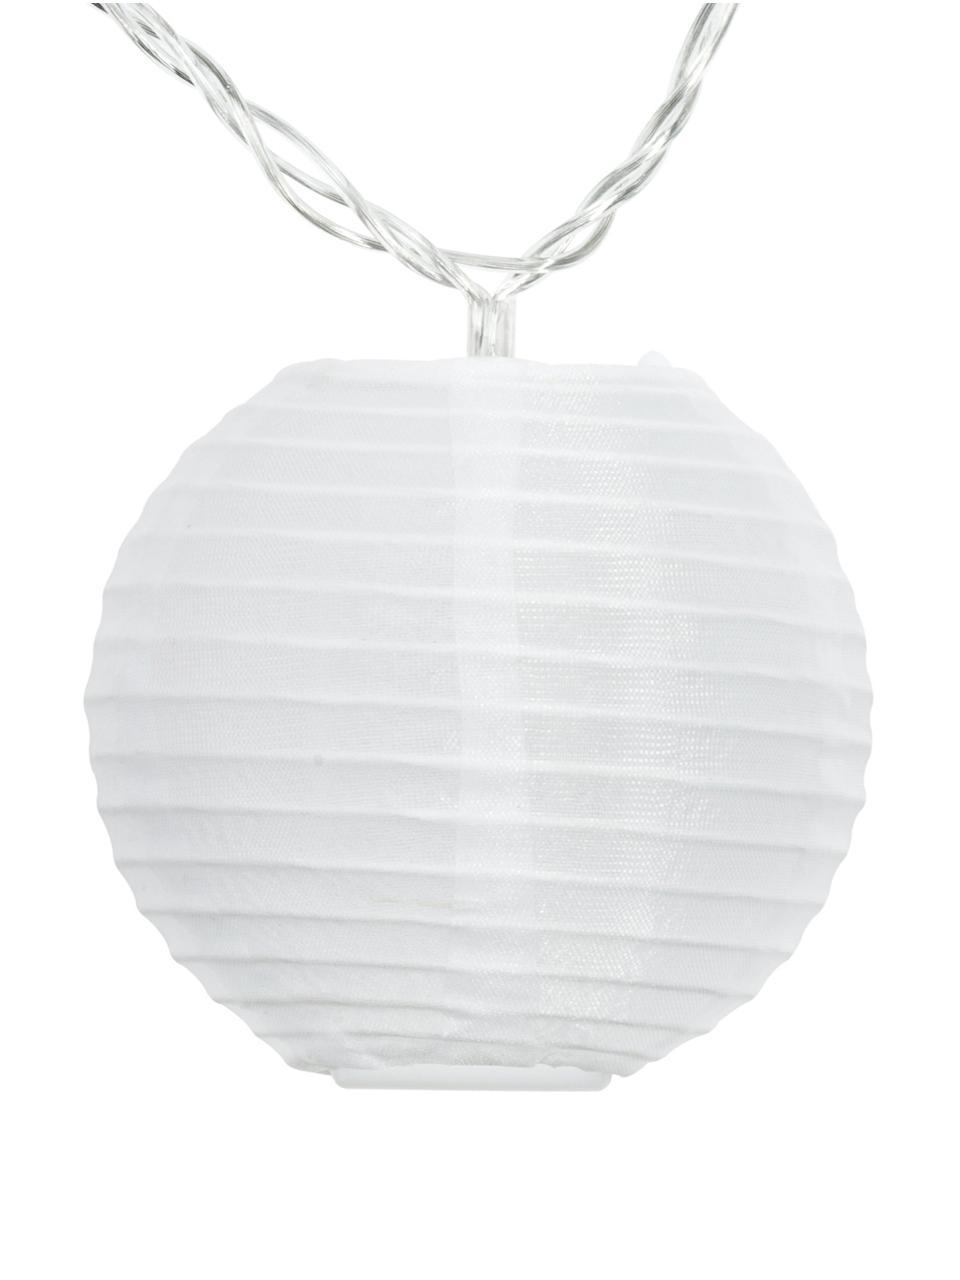 LED-Lichterkette Lampion, 450 cm, Lampions: Polyester, Weiß, L 450 cm